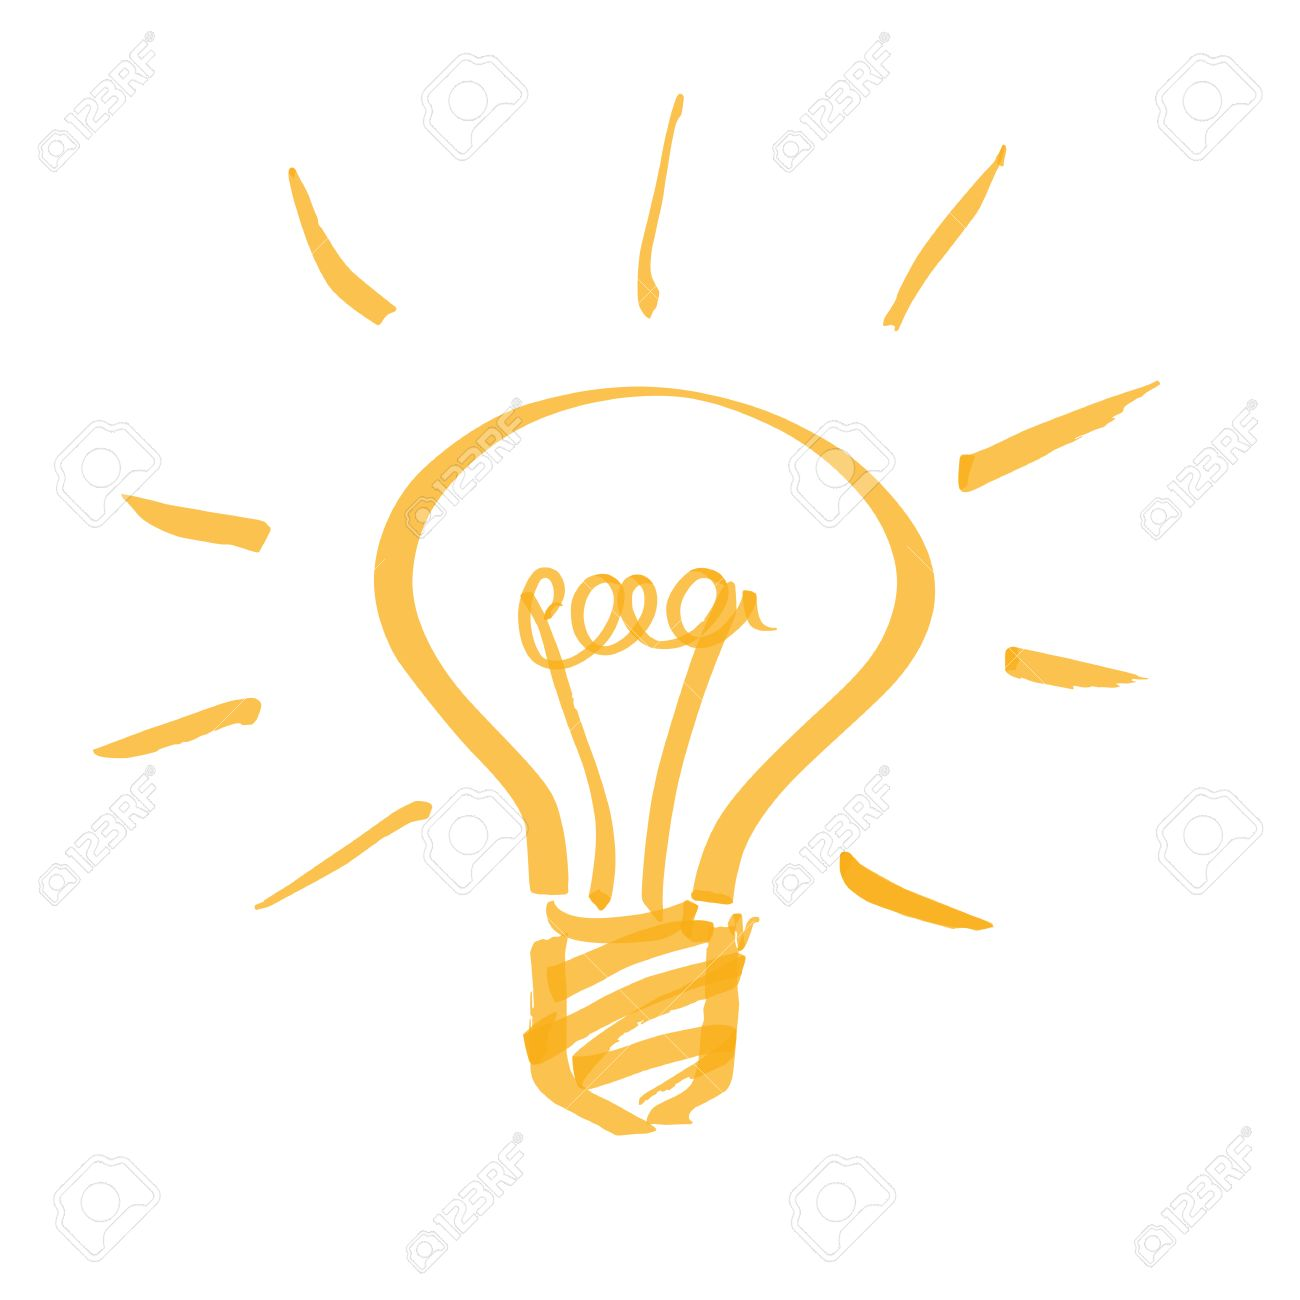 hand drawn light bulb - 28961425